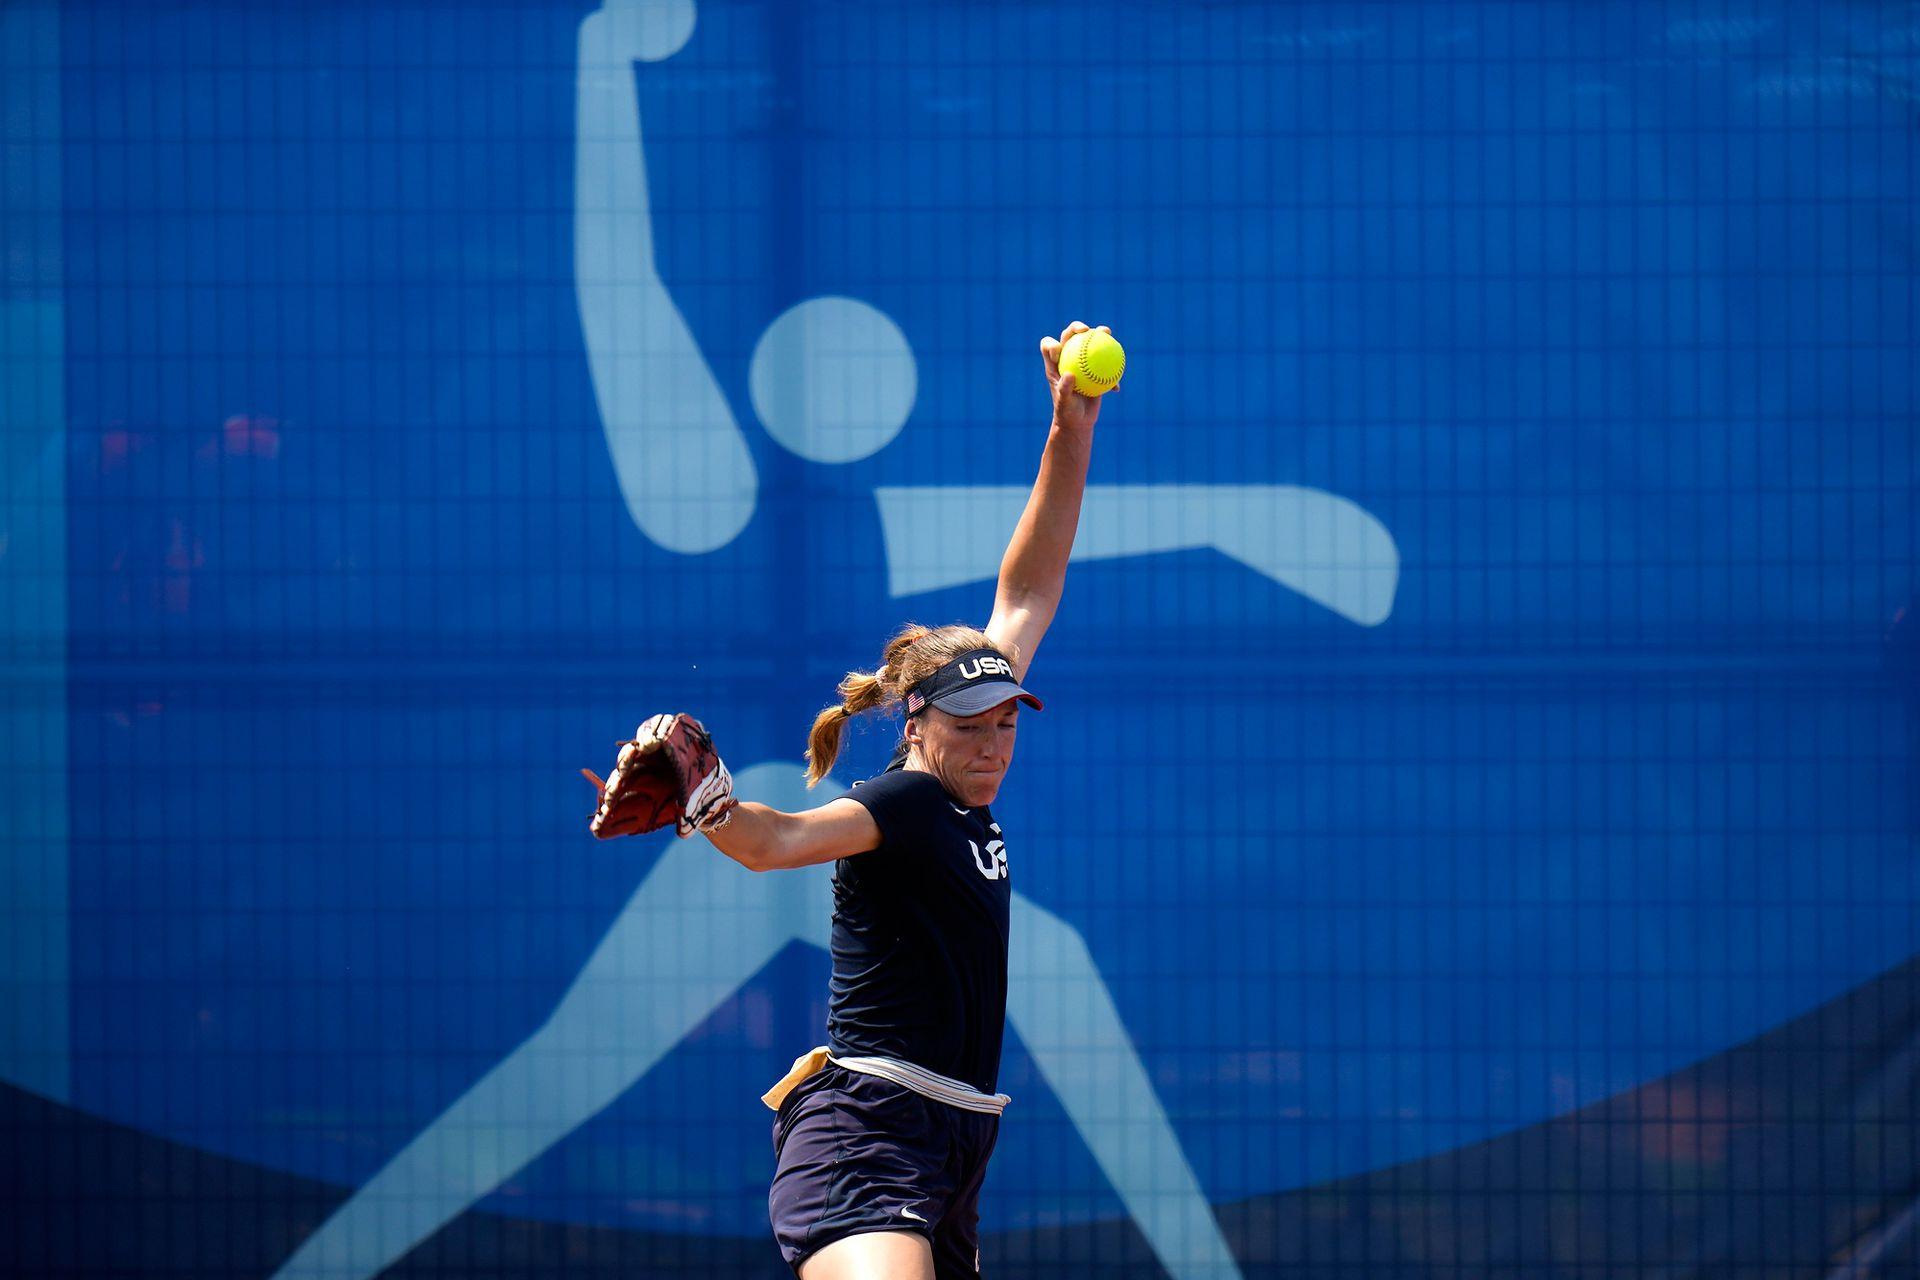 La pitcher del equipo estadounidense de softball, Monica Abbott, en acción.